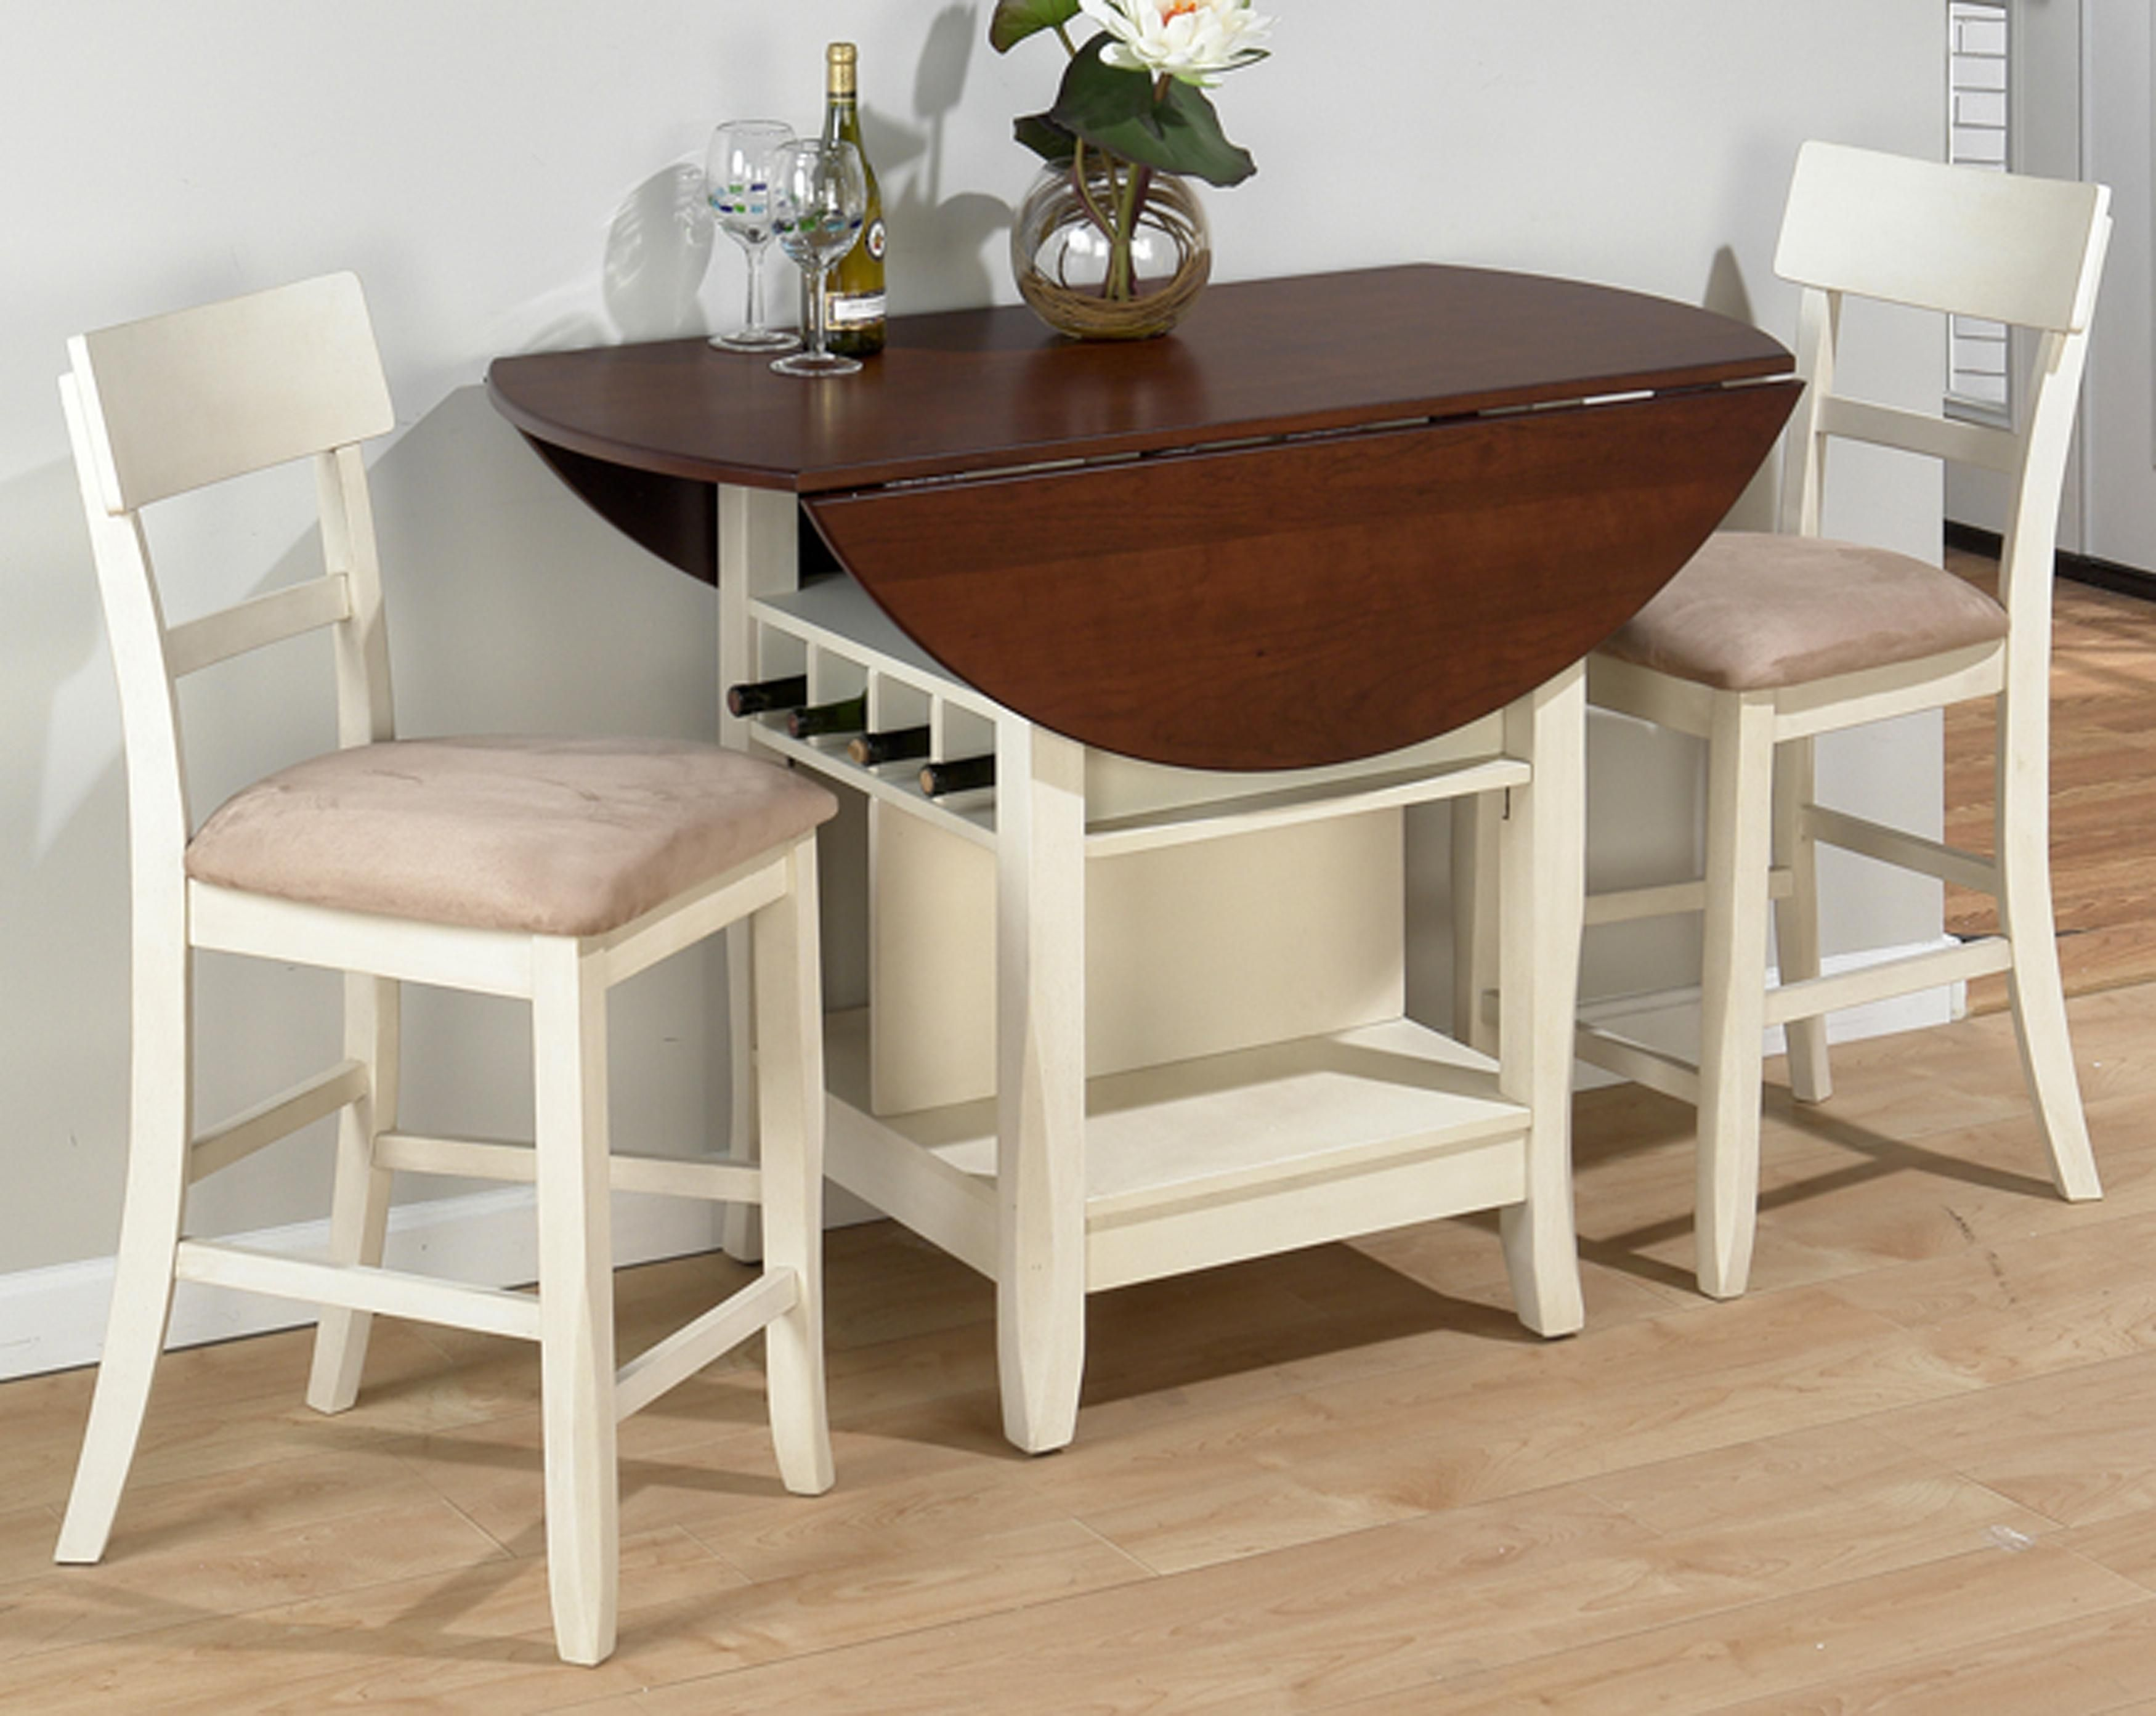 rectangular drop leaf kitchen table | momz house | Pinterest | Küche ...